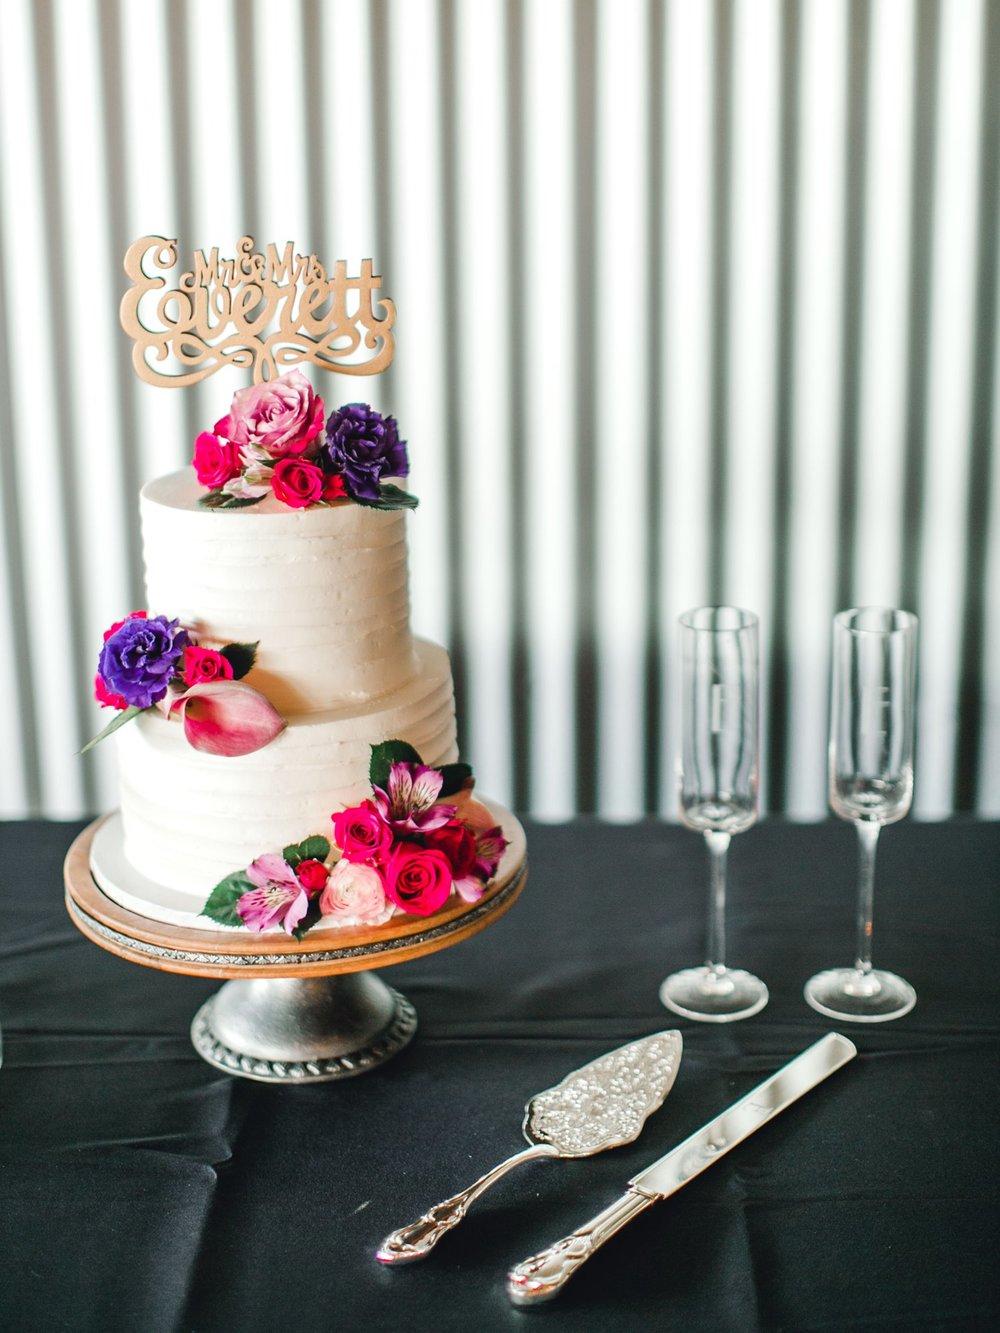 Jenna-and-garrett-Everett-kitalou-gin-lubbock-wedding-dayspring-designs-lubbock-wedding-photographer_0156.jpg